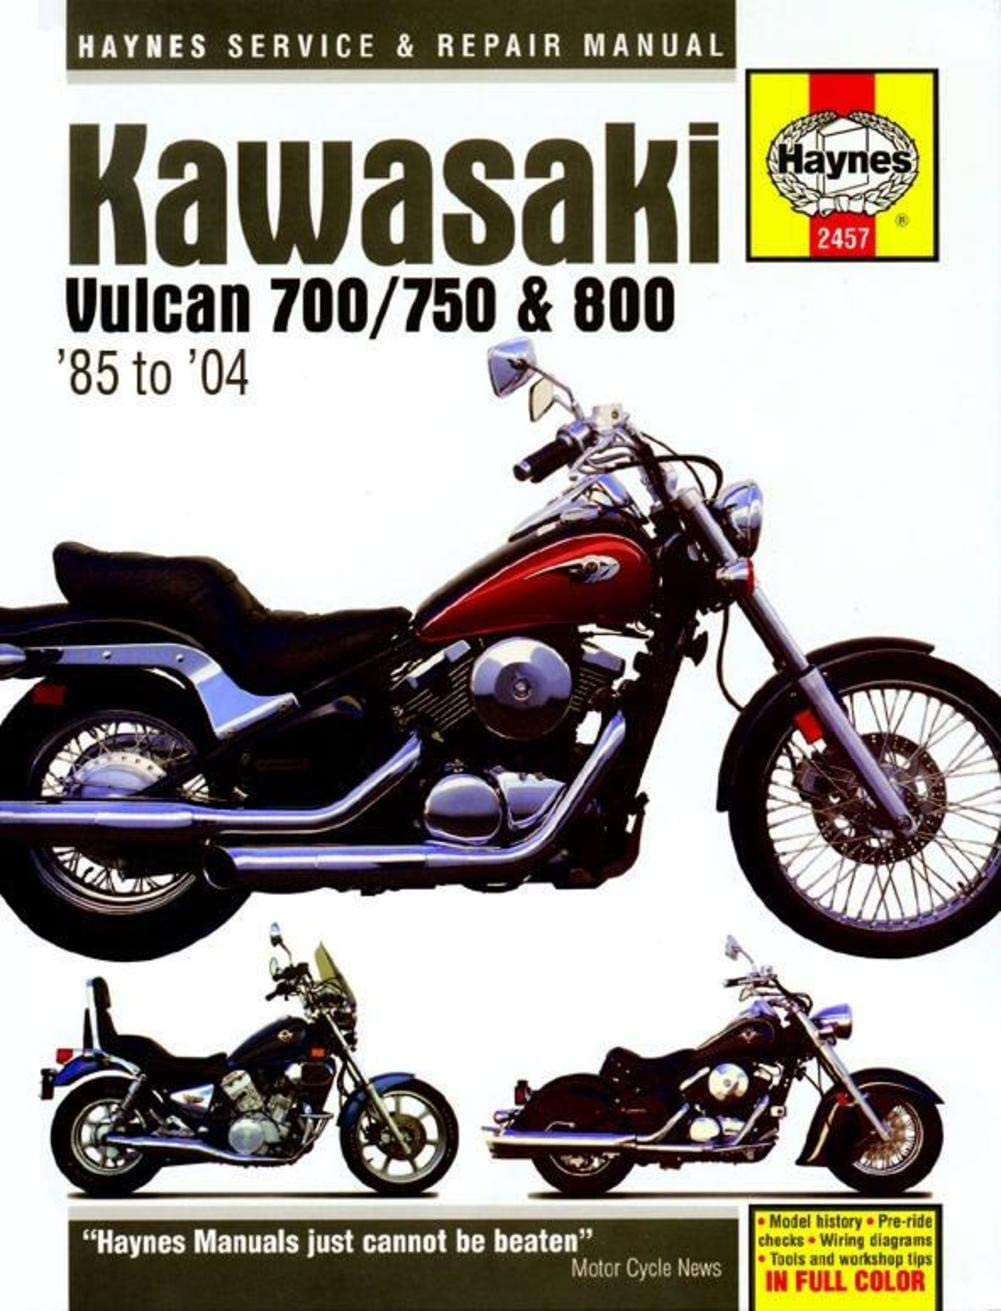 Haynes Kawasaki Vulcan 700/750/800 Manual M2457: Automotive - Amazon.comAmazon.com